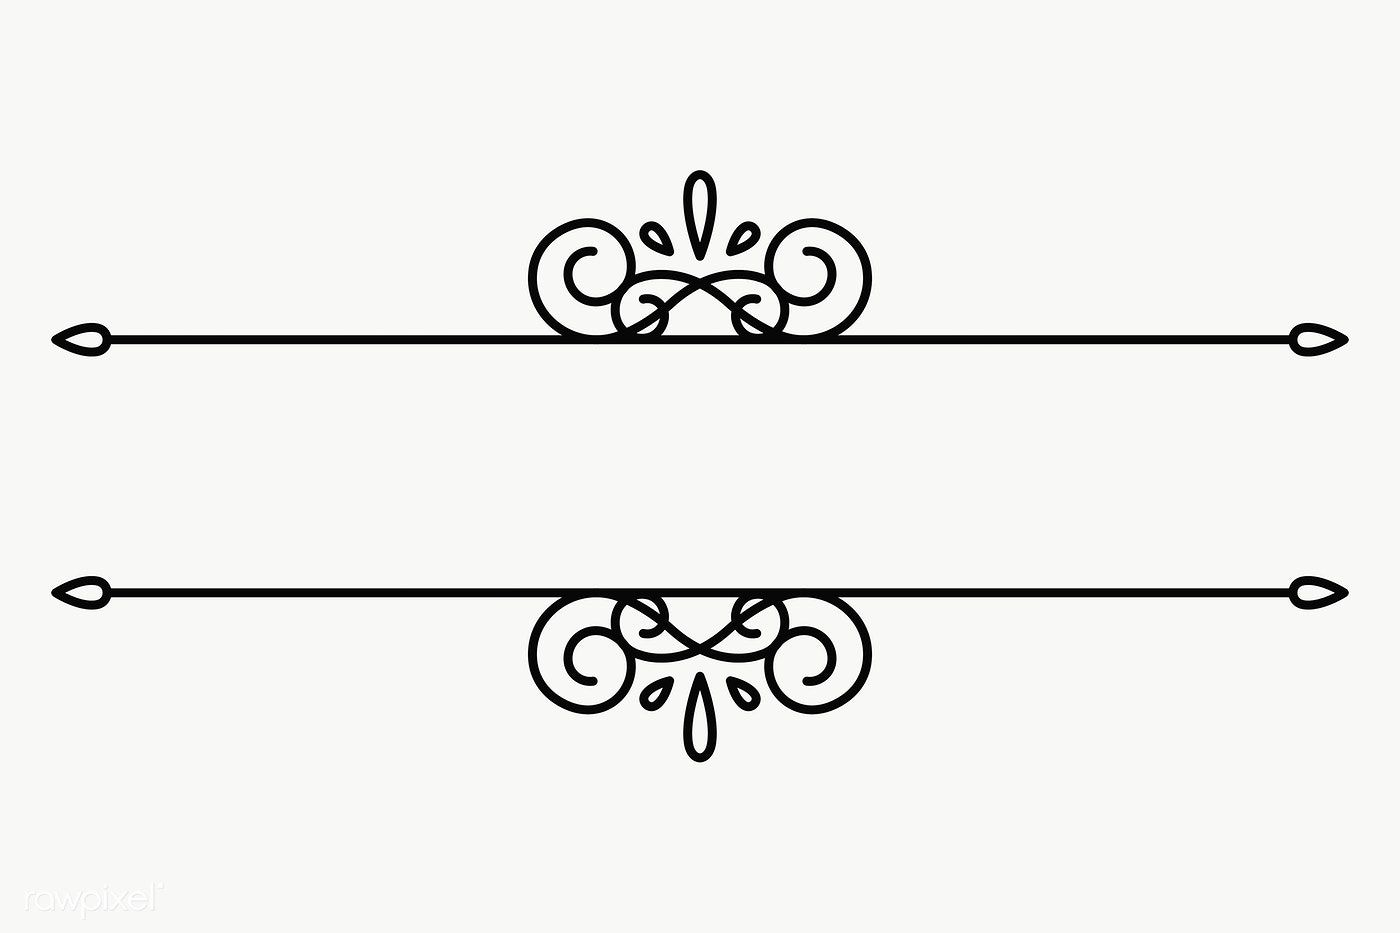 Vintage Line Frame Transparent Png Premium Image By Rawpixel Com Aew Lettering Fonts Vintage Frames Monogram Stencil